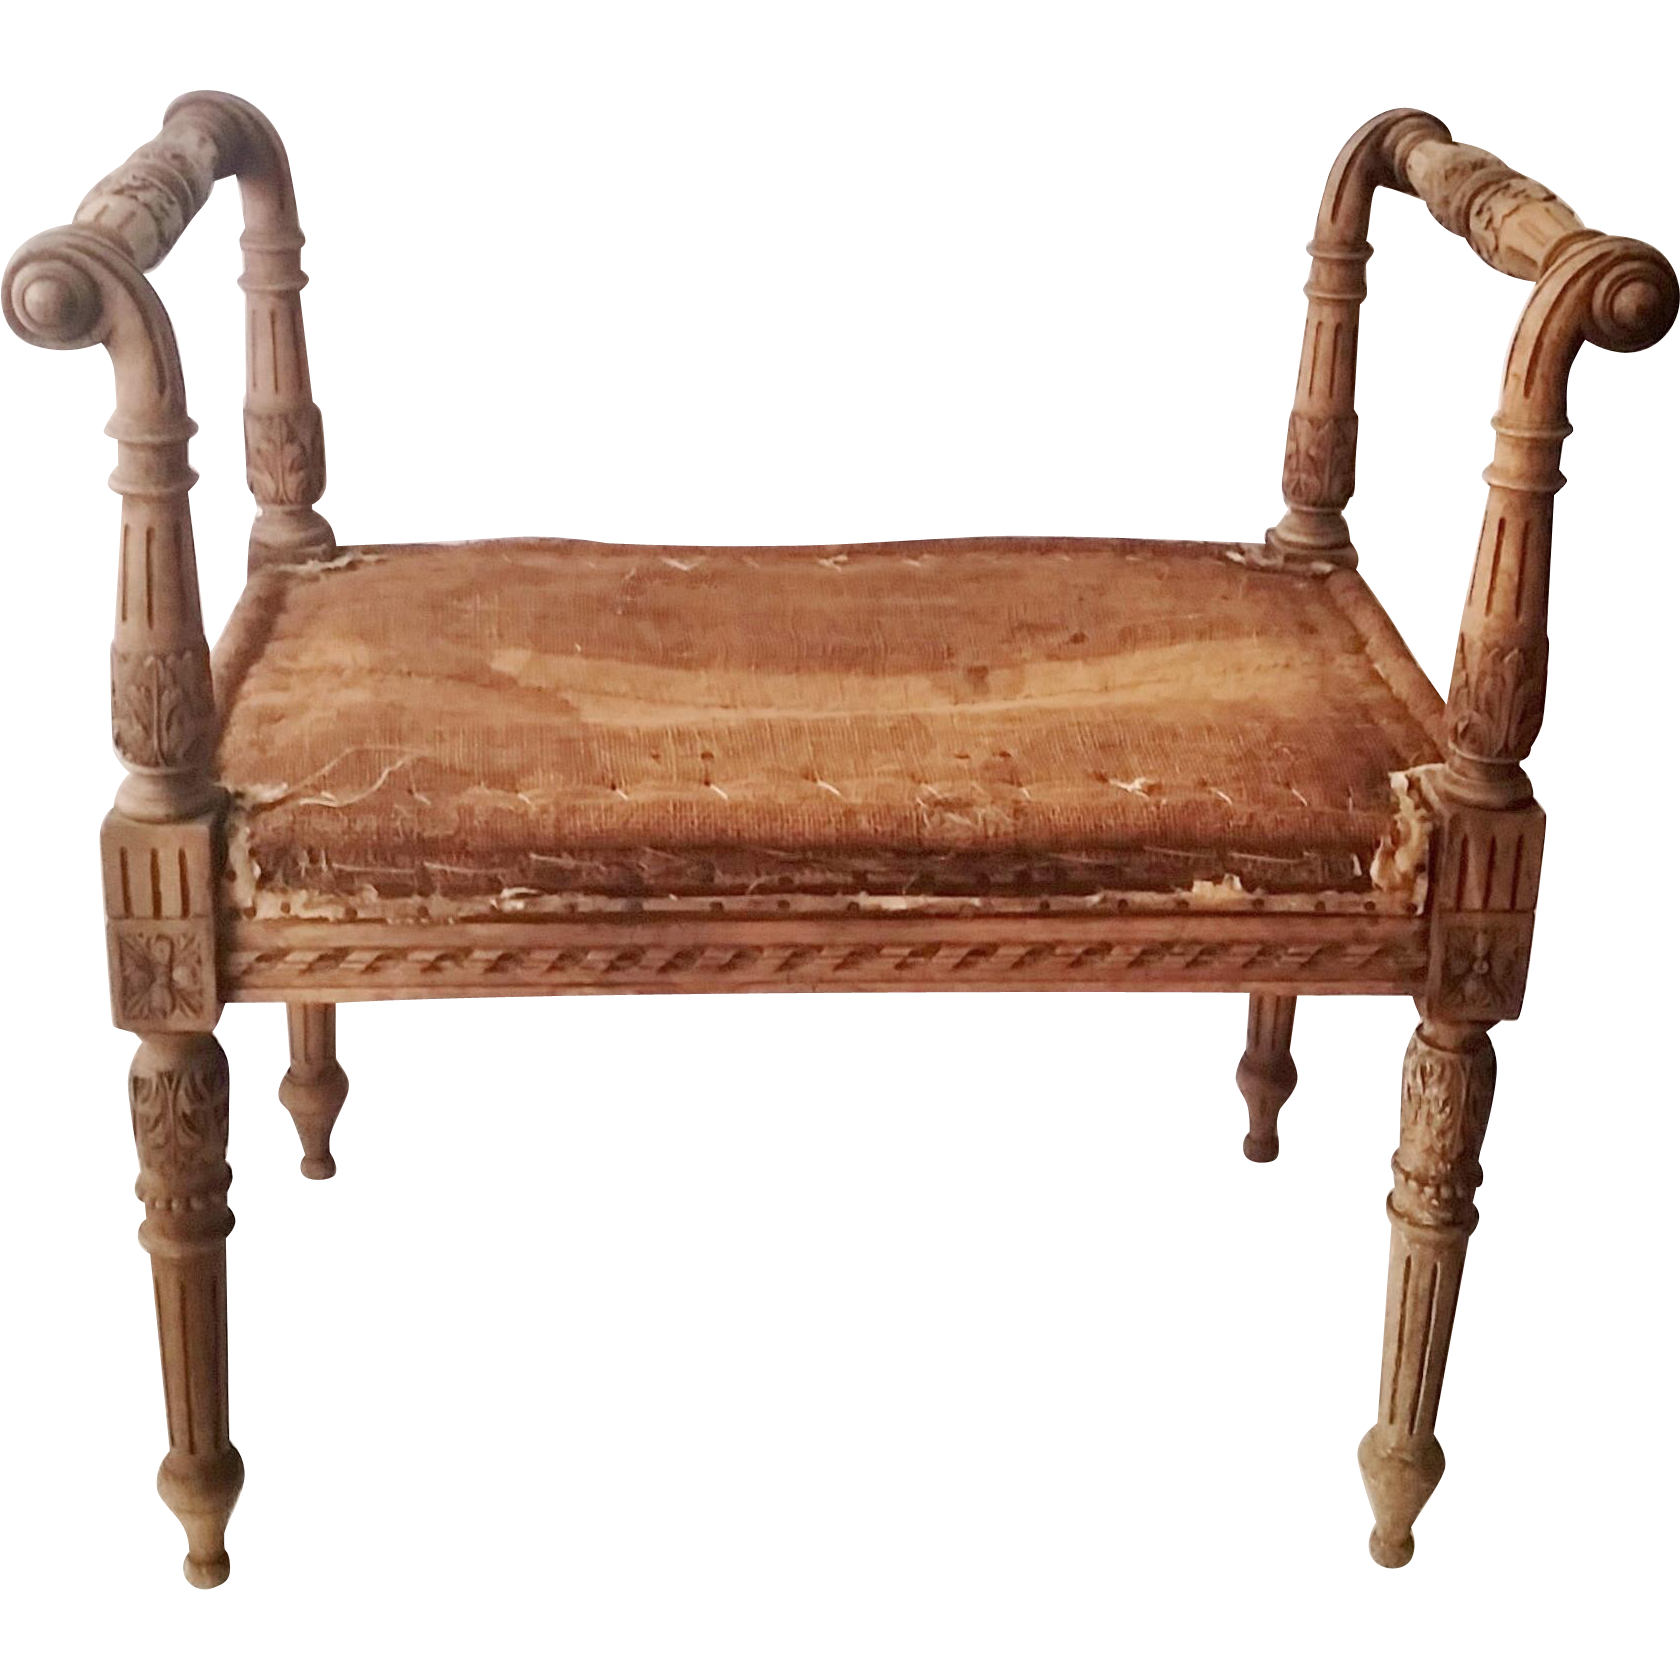 19th C French Walnut Bench Window Seat Antique French Bench Bench Window Seat